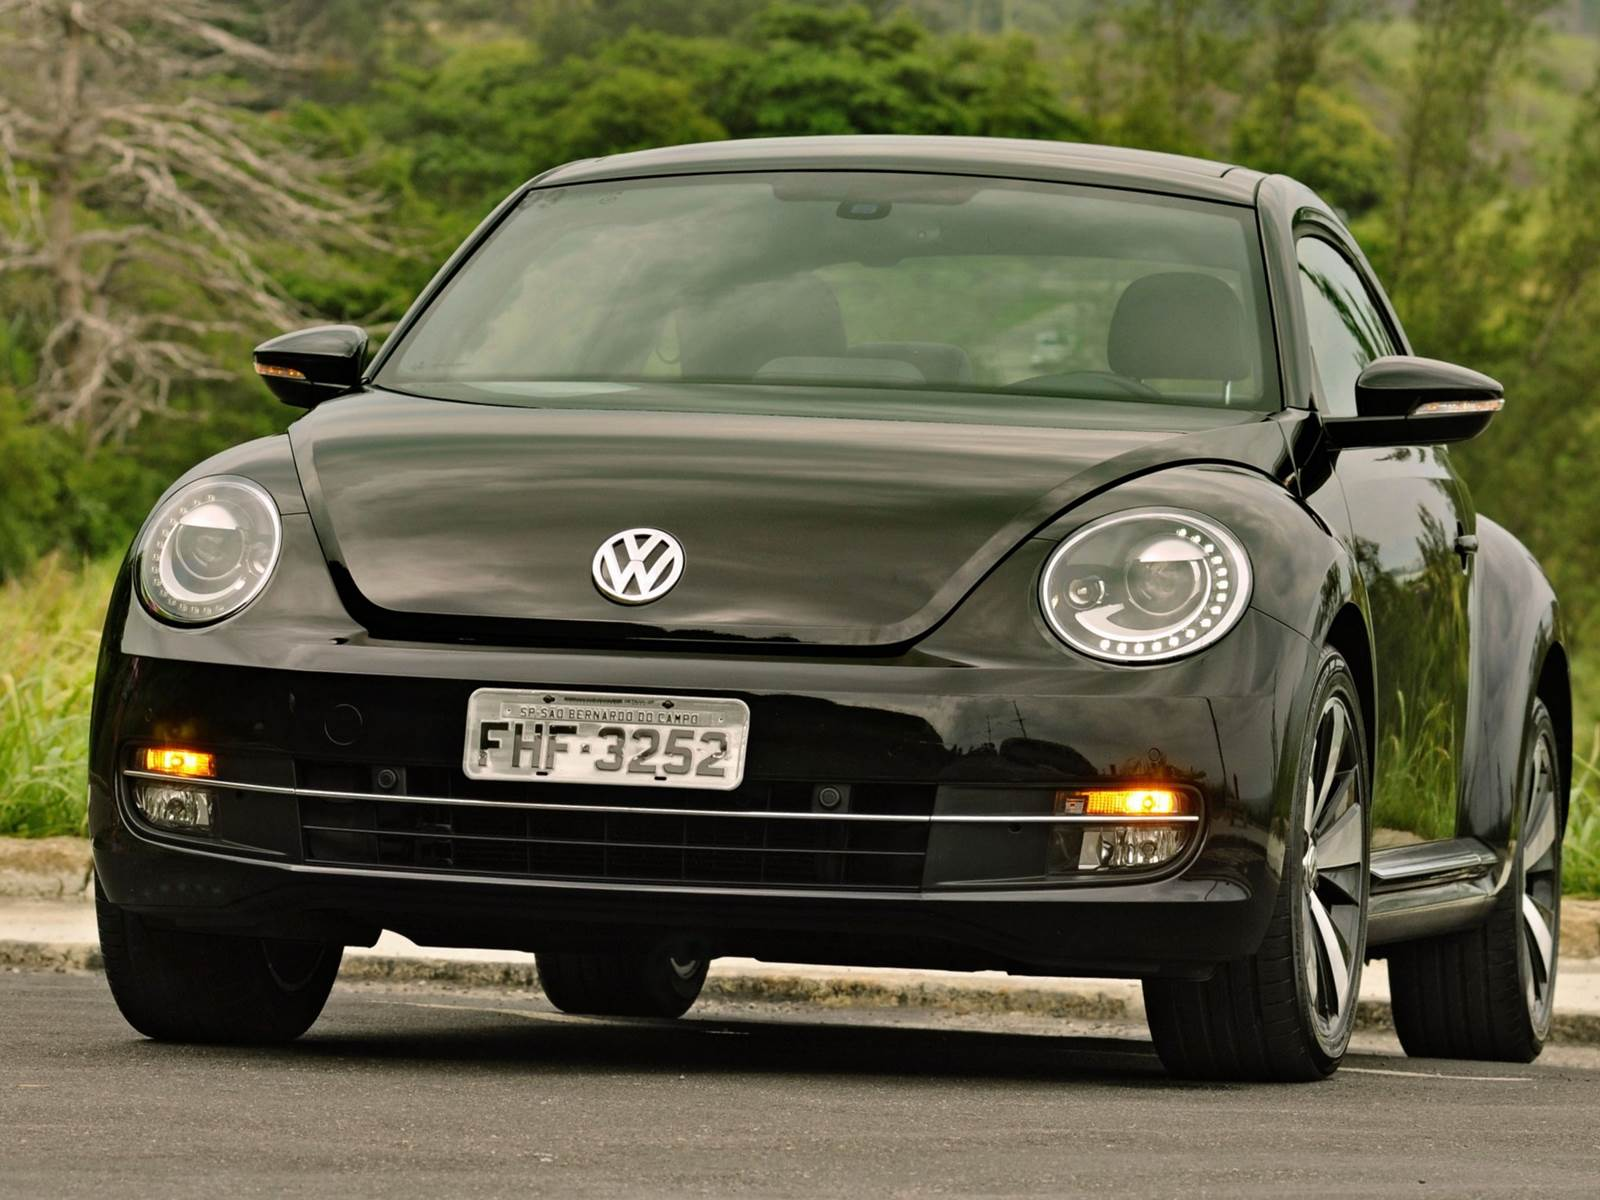 VW Fusca 2.0 Recall